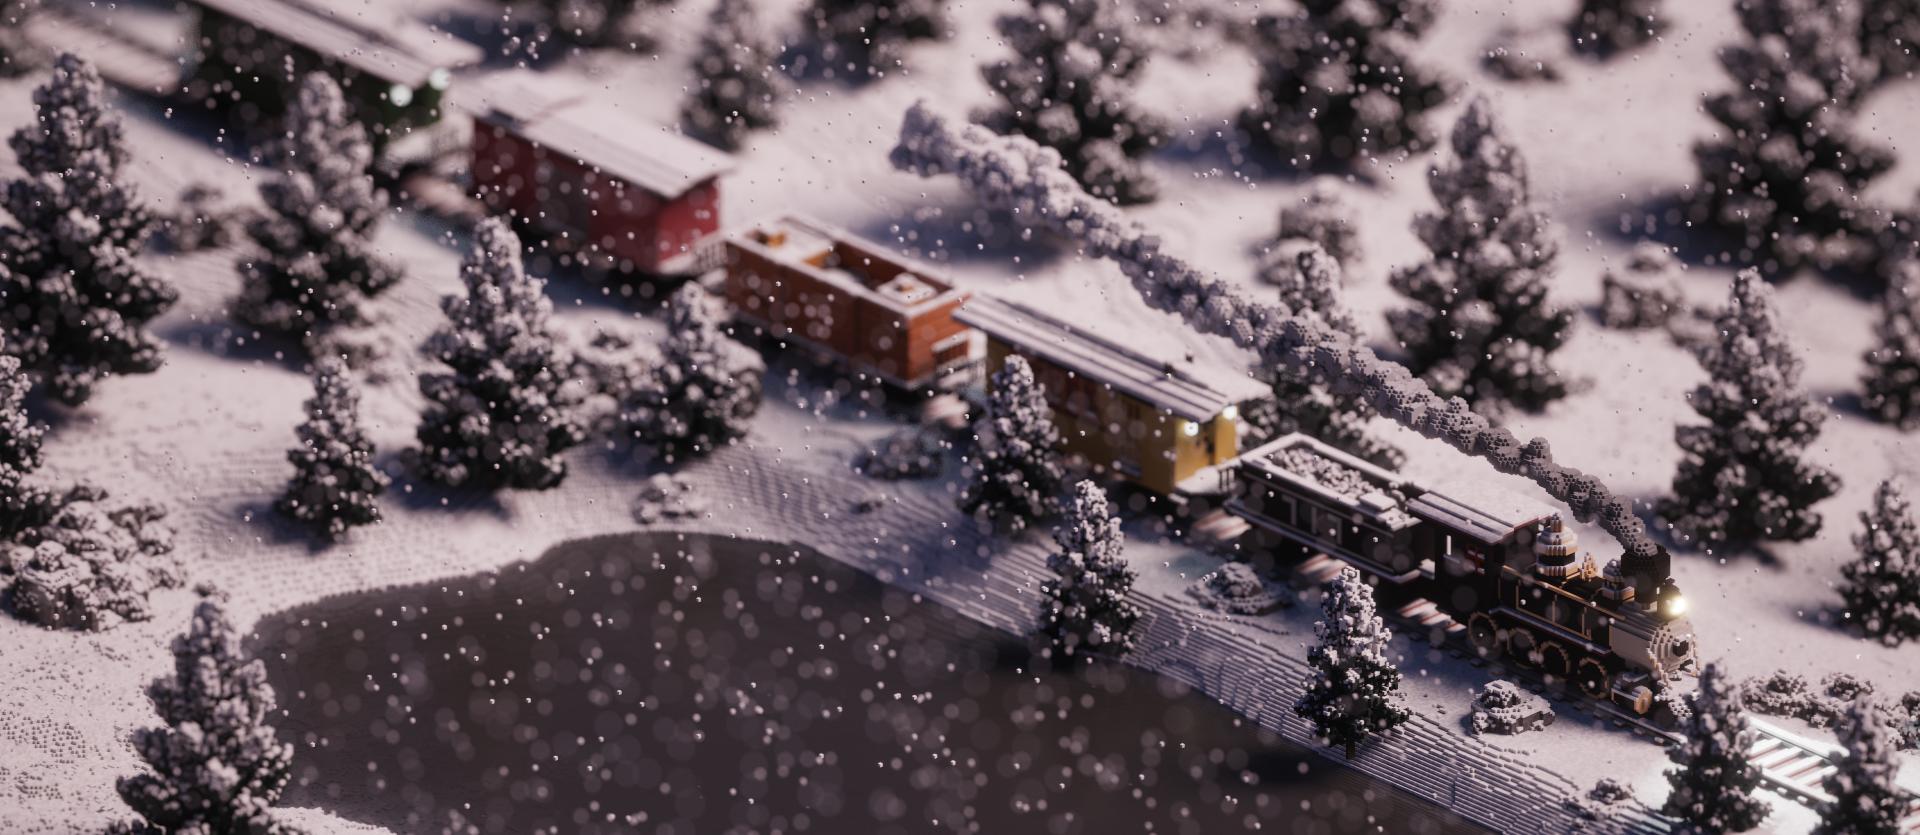 [AUTRES LOGICIELS] MagicaVoxel! - Page 3 Snowy_Train